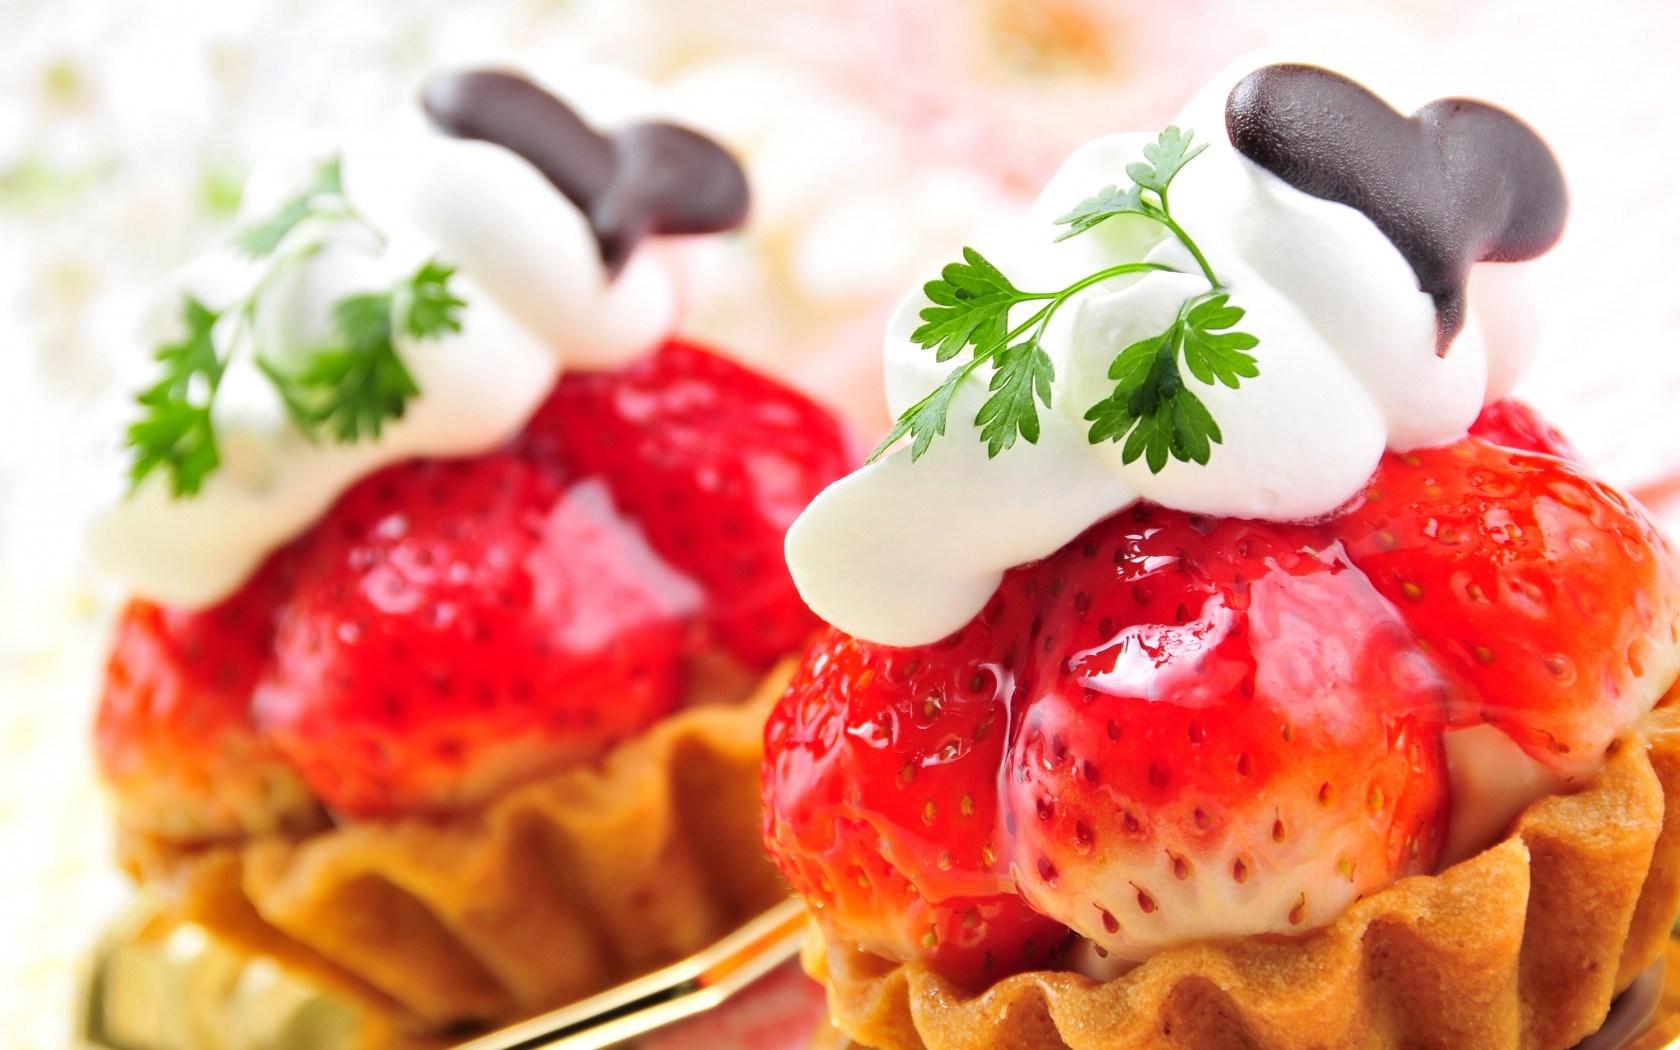 Sweets Cakes Cream Berries Strawberries